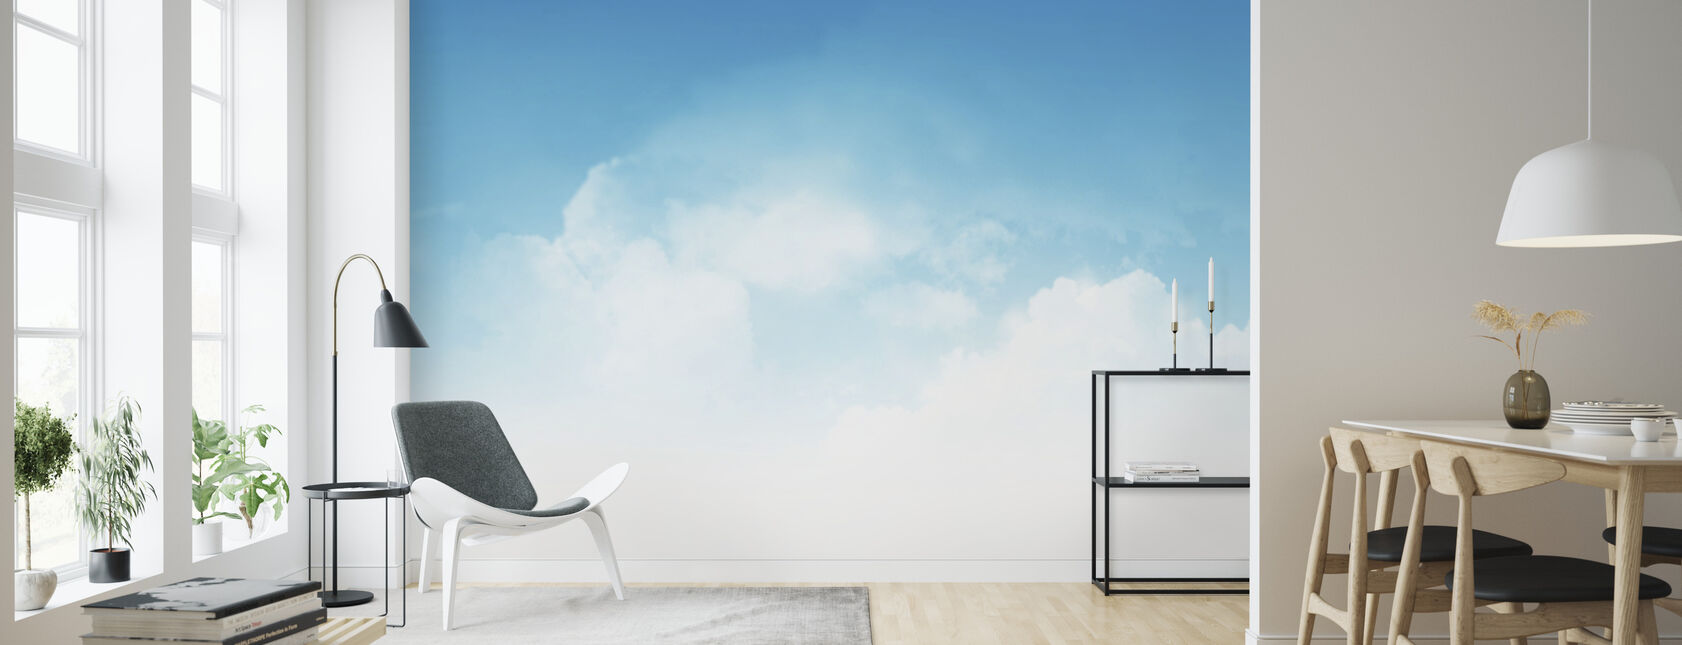 Cloudy Blue Sky - Wallpaper - Living Room